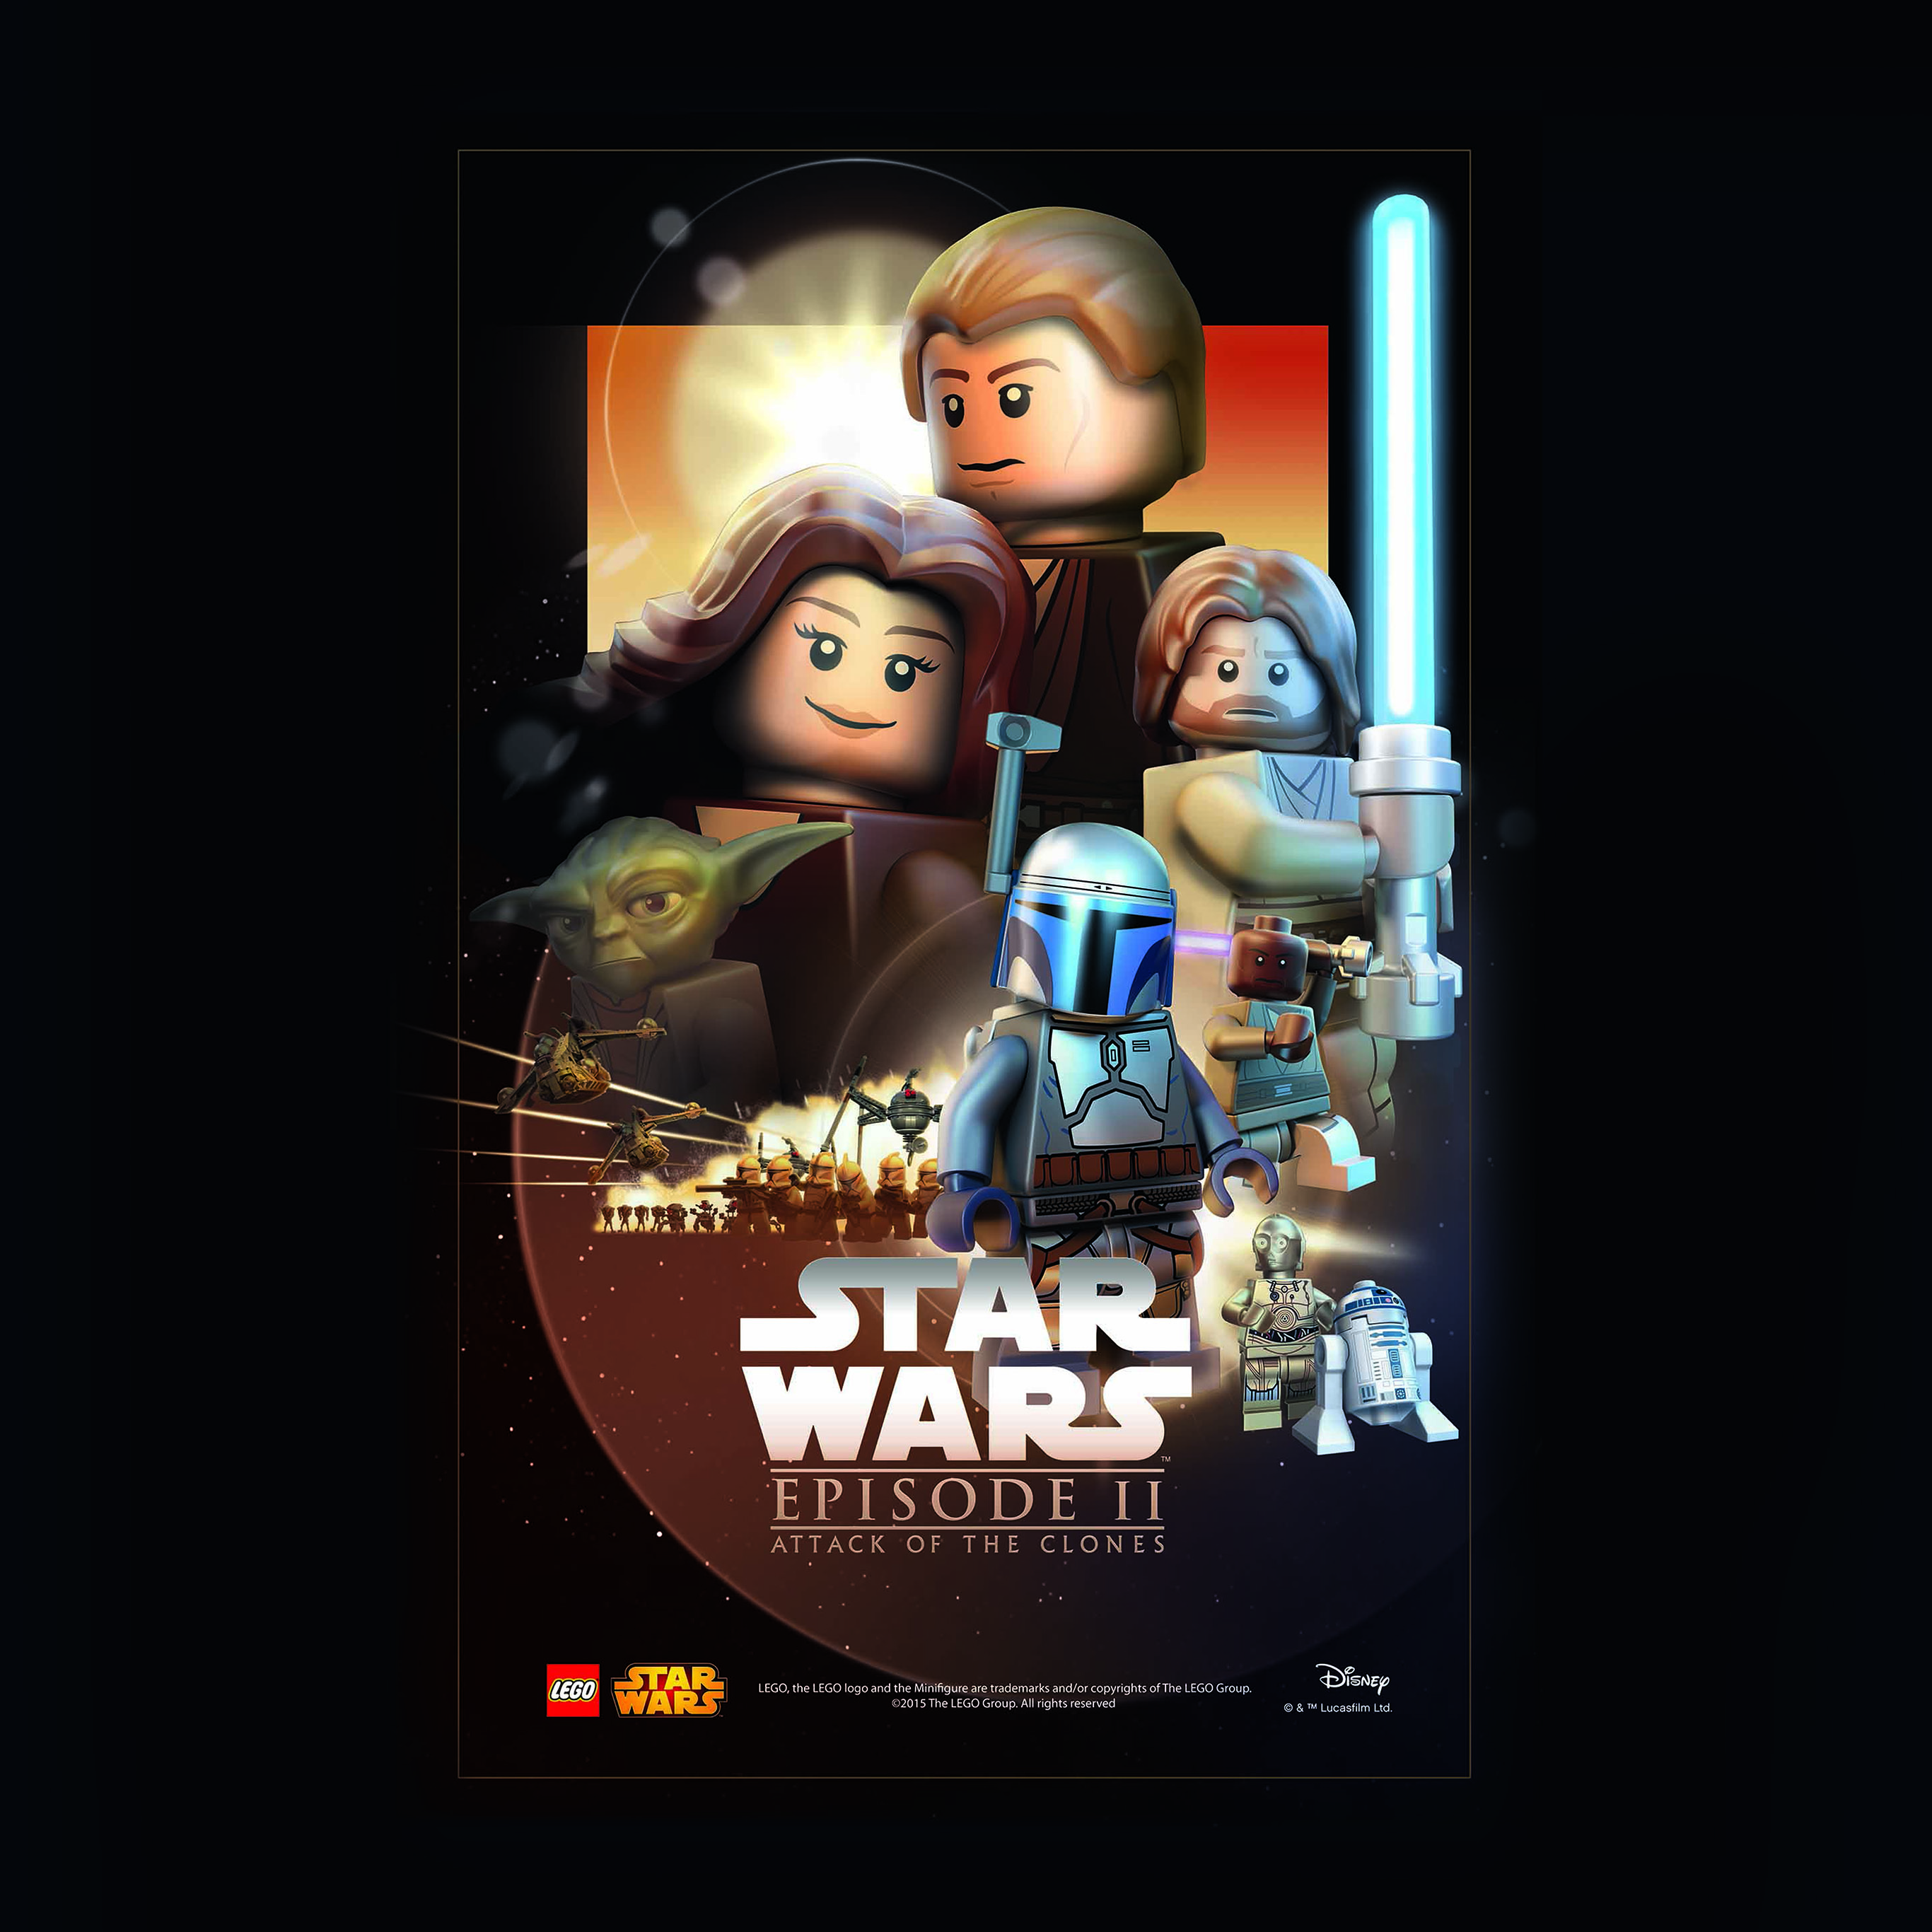 Ap28 Starwars Lego Episode 2 Attack Of Clones Art Film Wallpaper